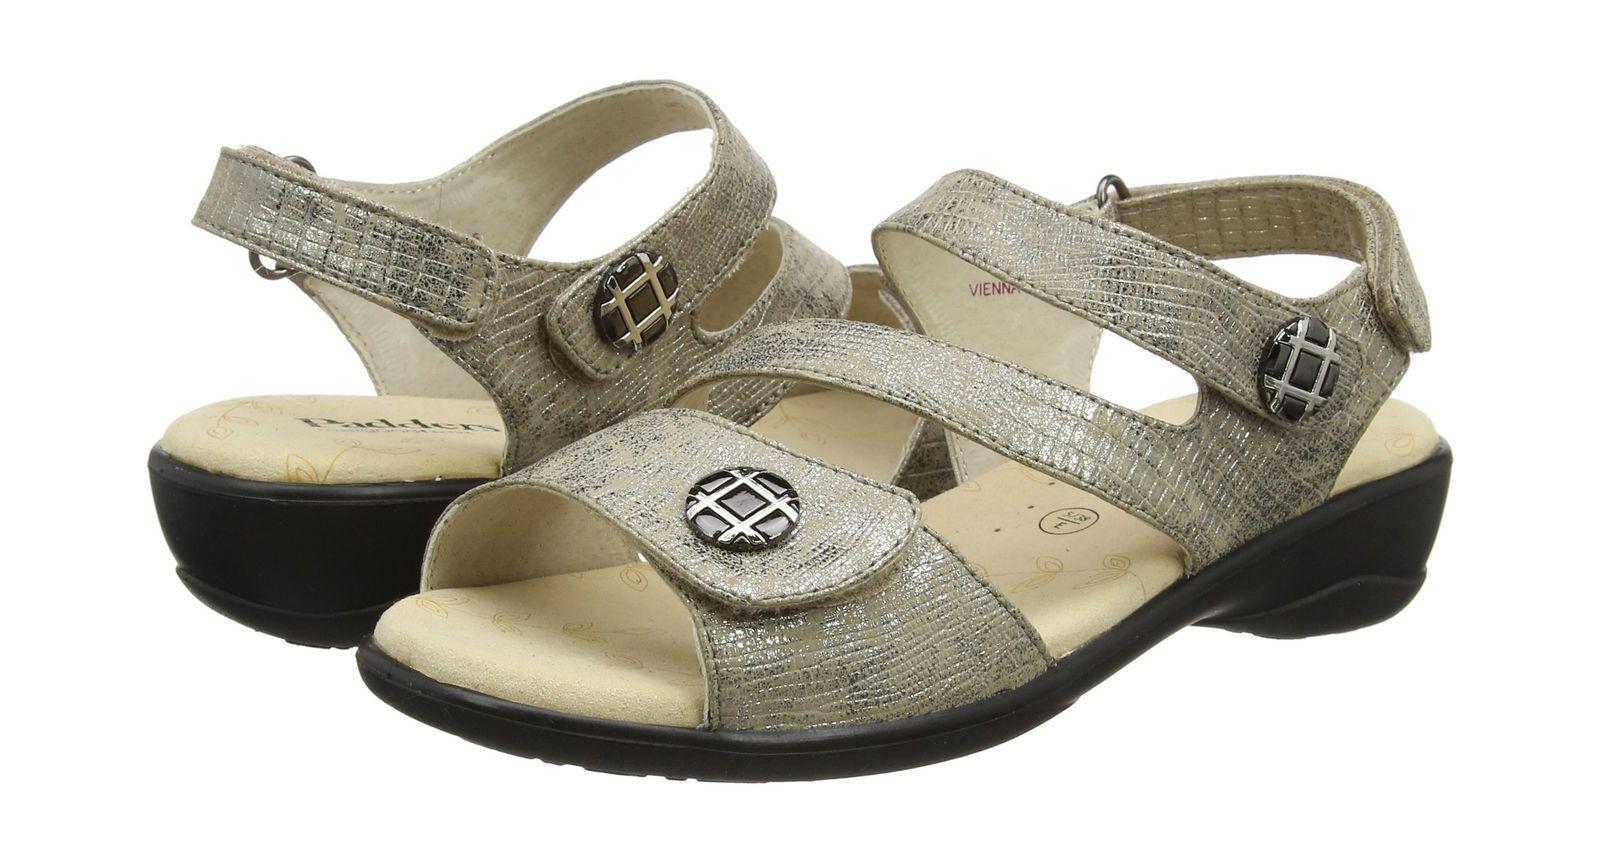 Padders Damenschuhe Vienna Ankle Strap Sandales Größe UK 5 Colour Metallic